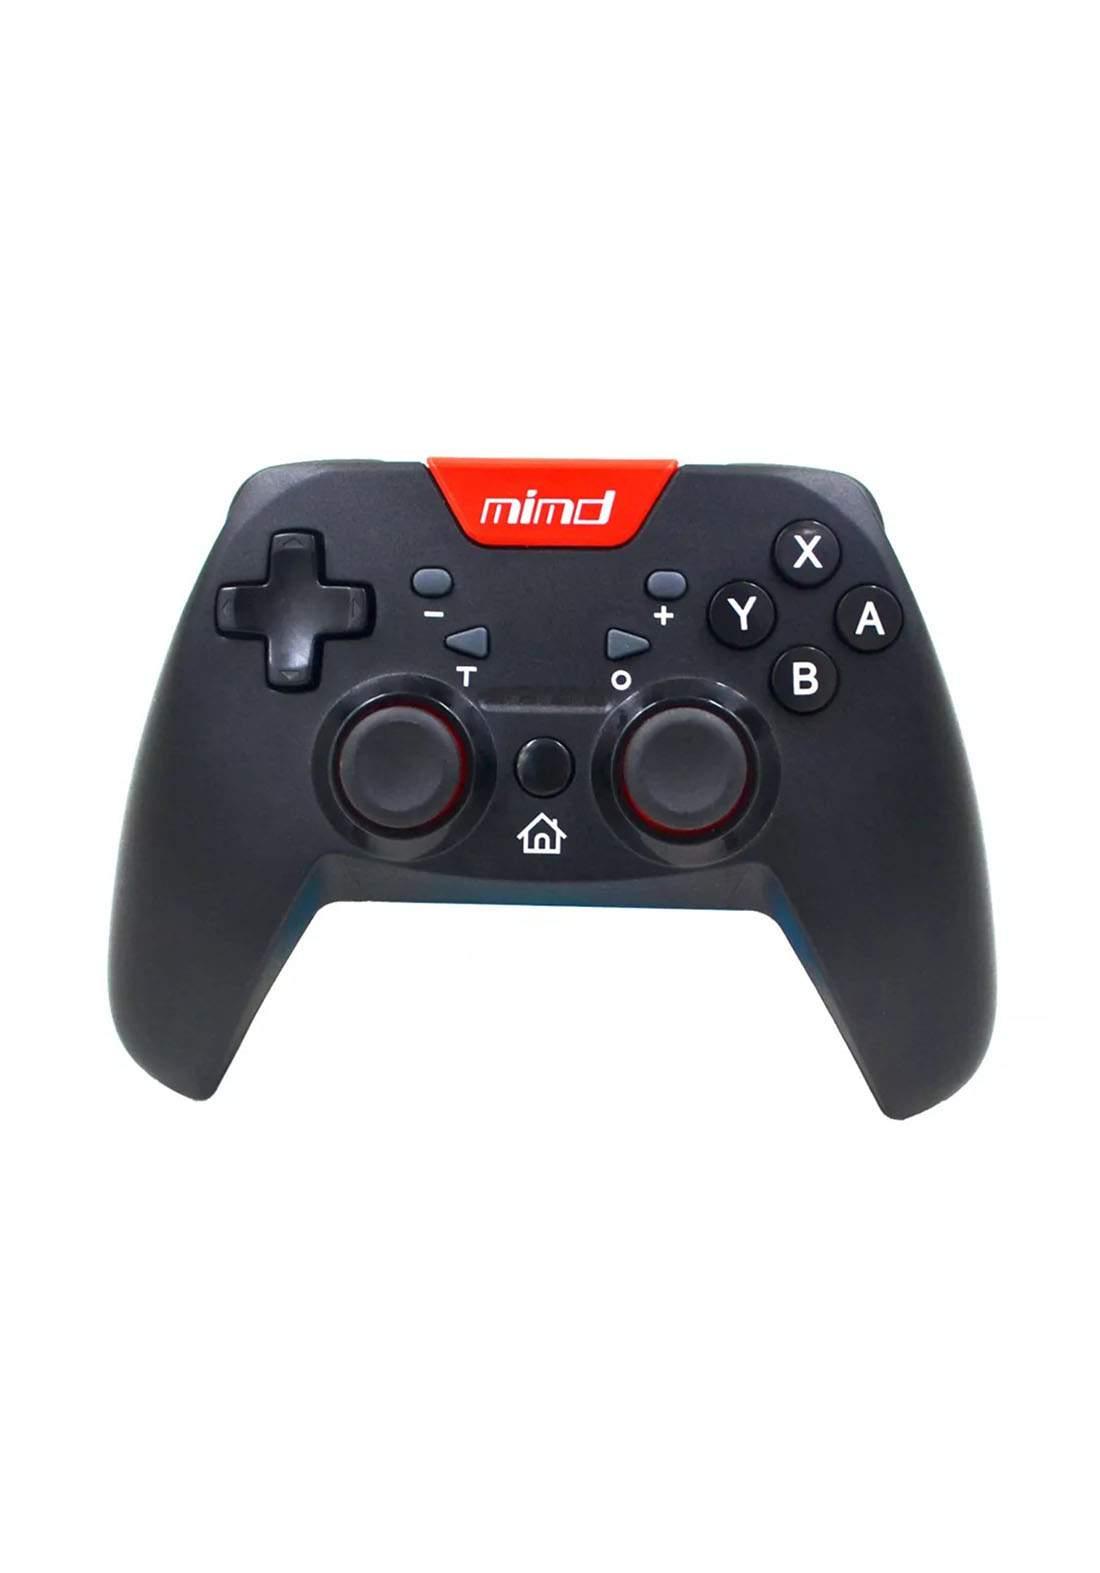 MIMD  HSY-013 Wireless Controller for Nintendo Switch - Black وحدة تحكم